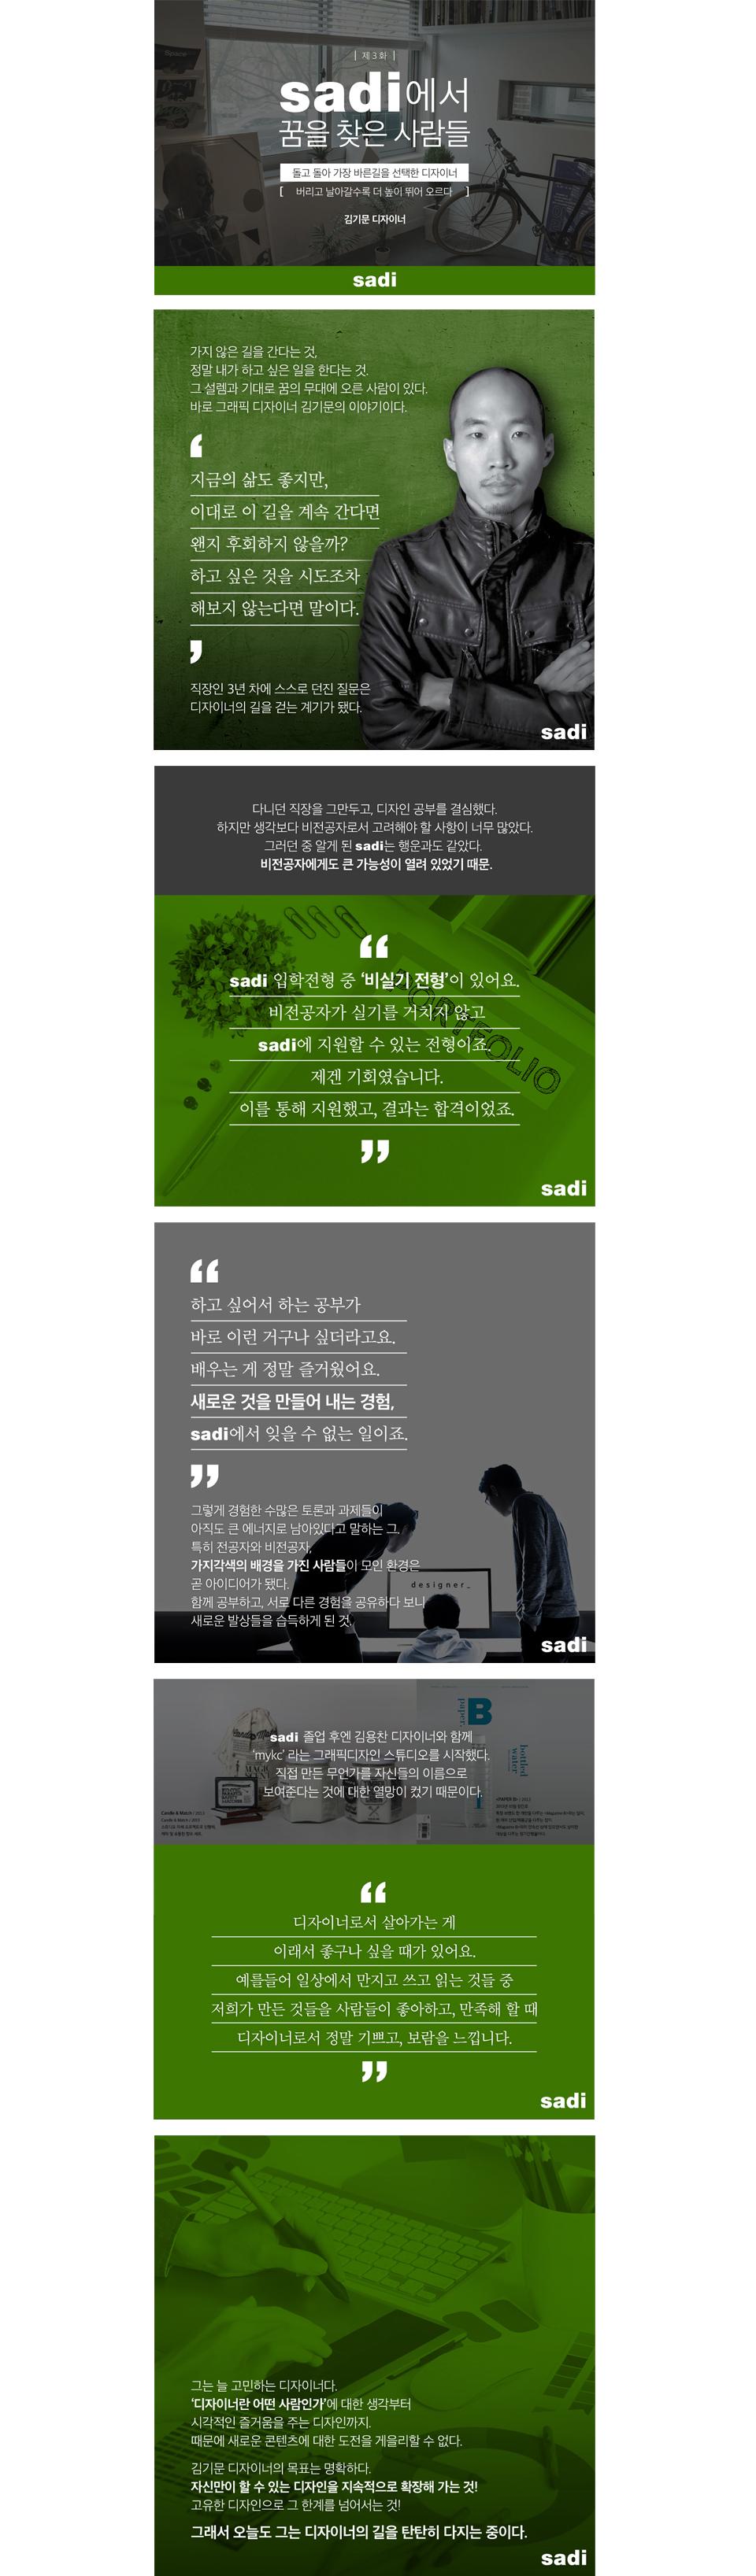 [sadi에서 꿈을 찾은 사람들] 버리고 날아갈수록 더 높이 뛰어 오르다!_김기문 디자이너 편 첨부 이미지 -